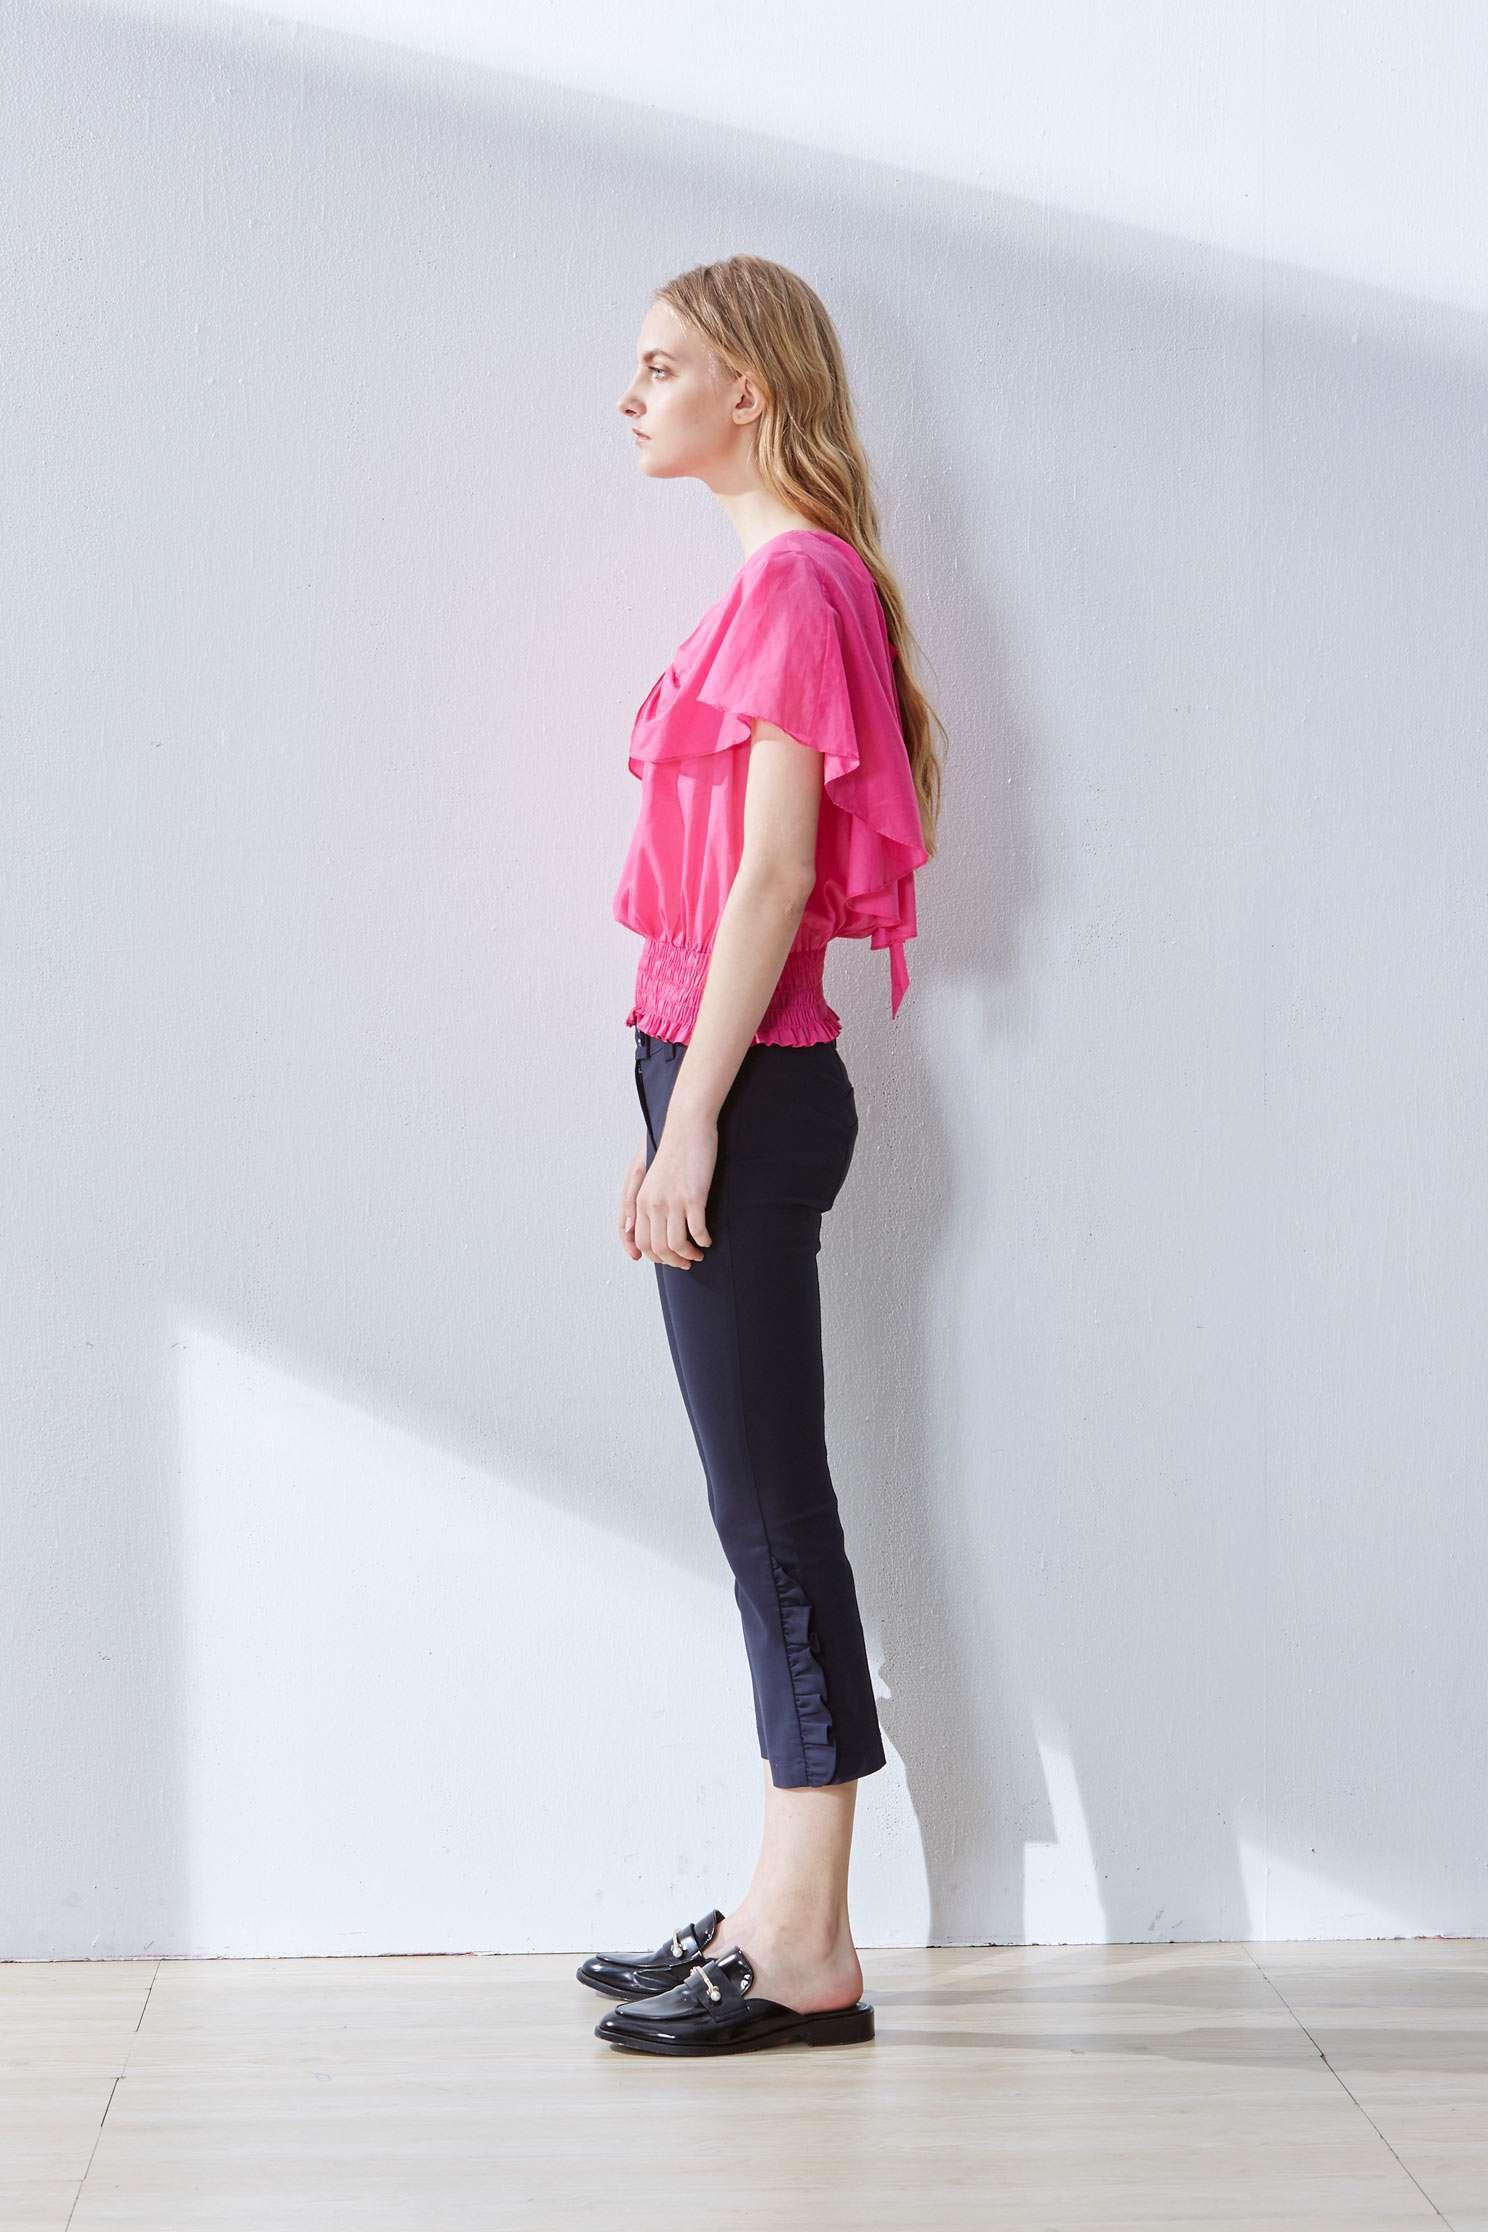 Style fashion pants